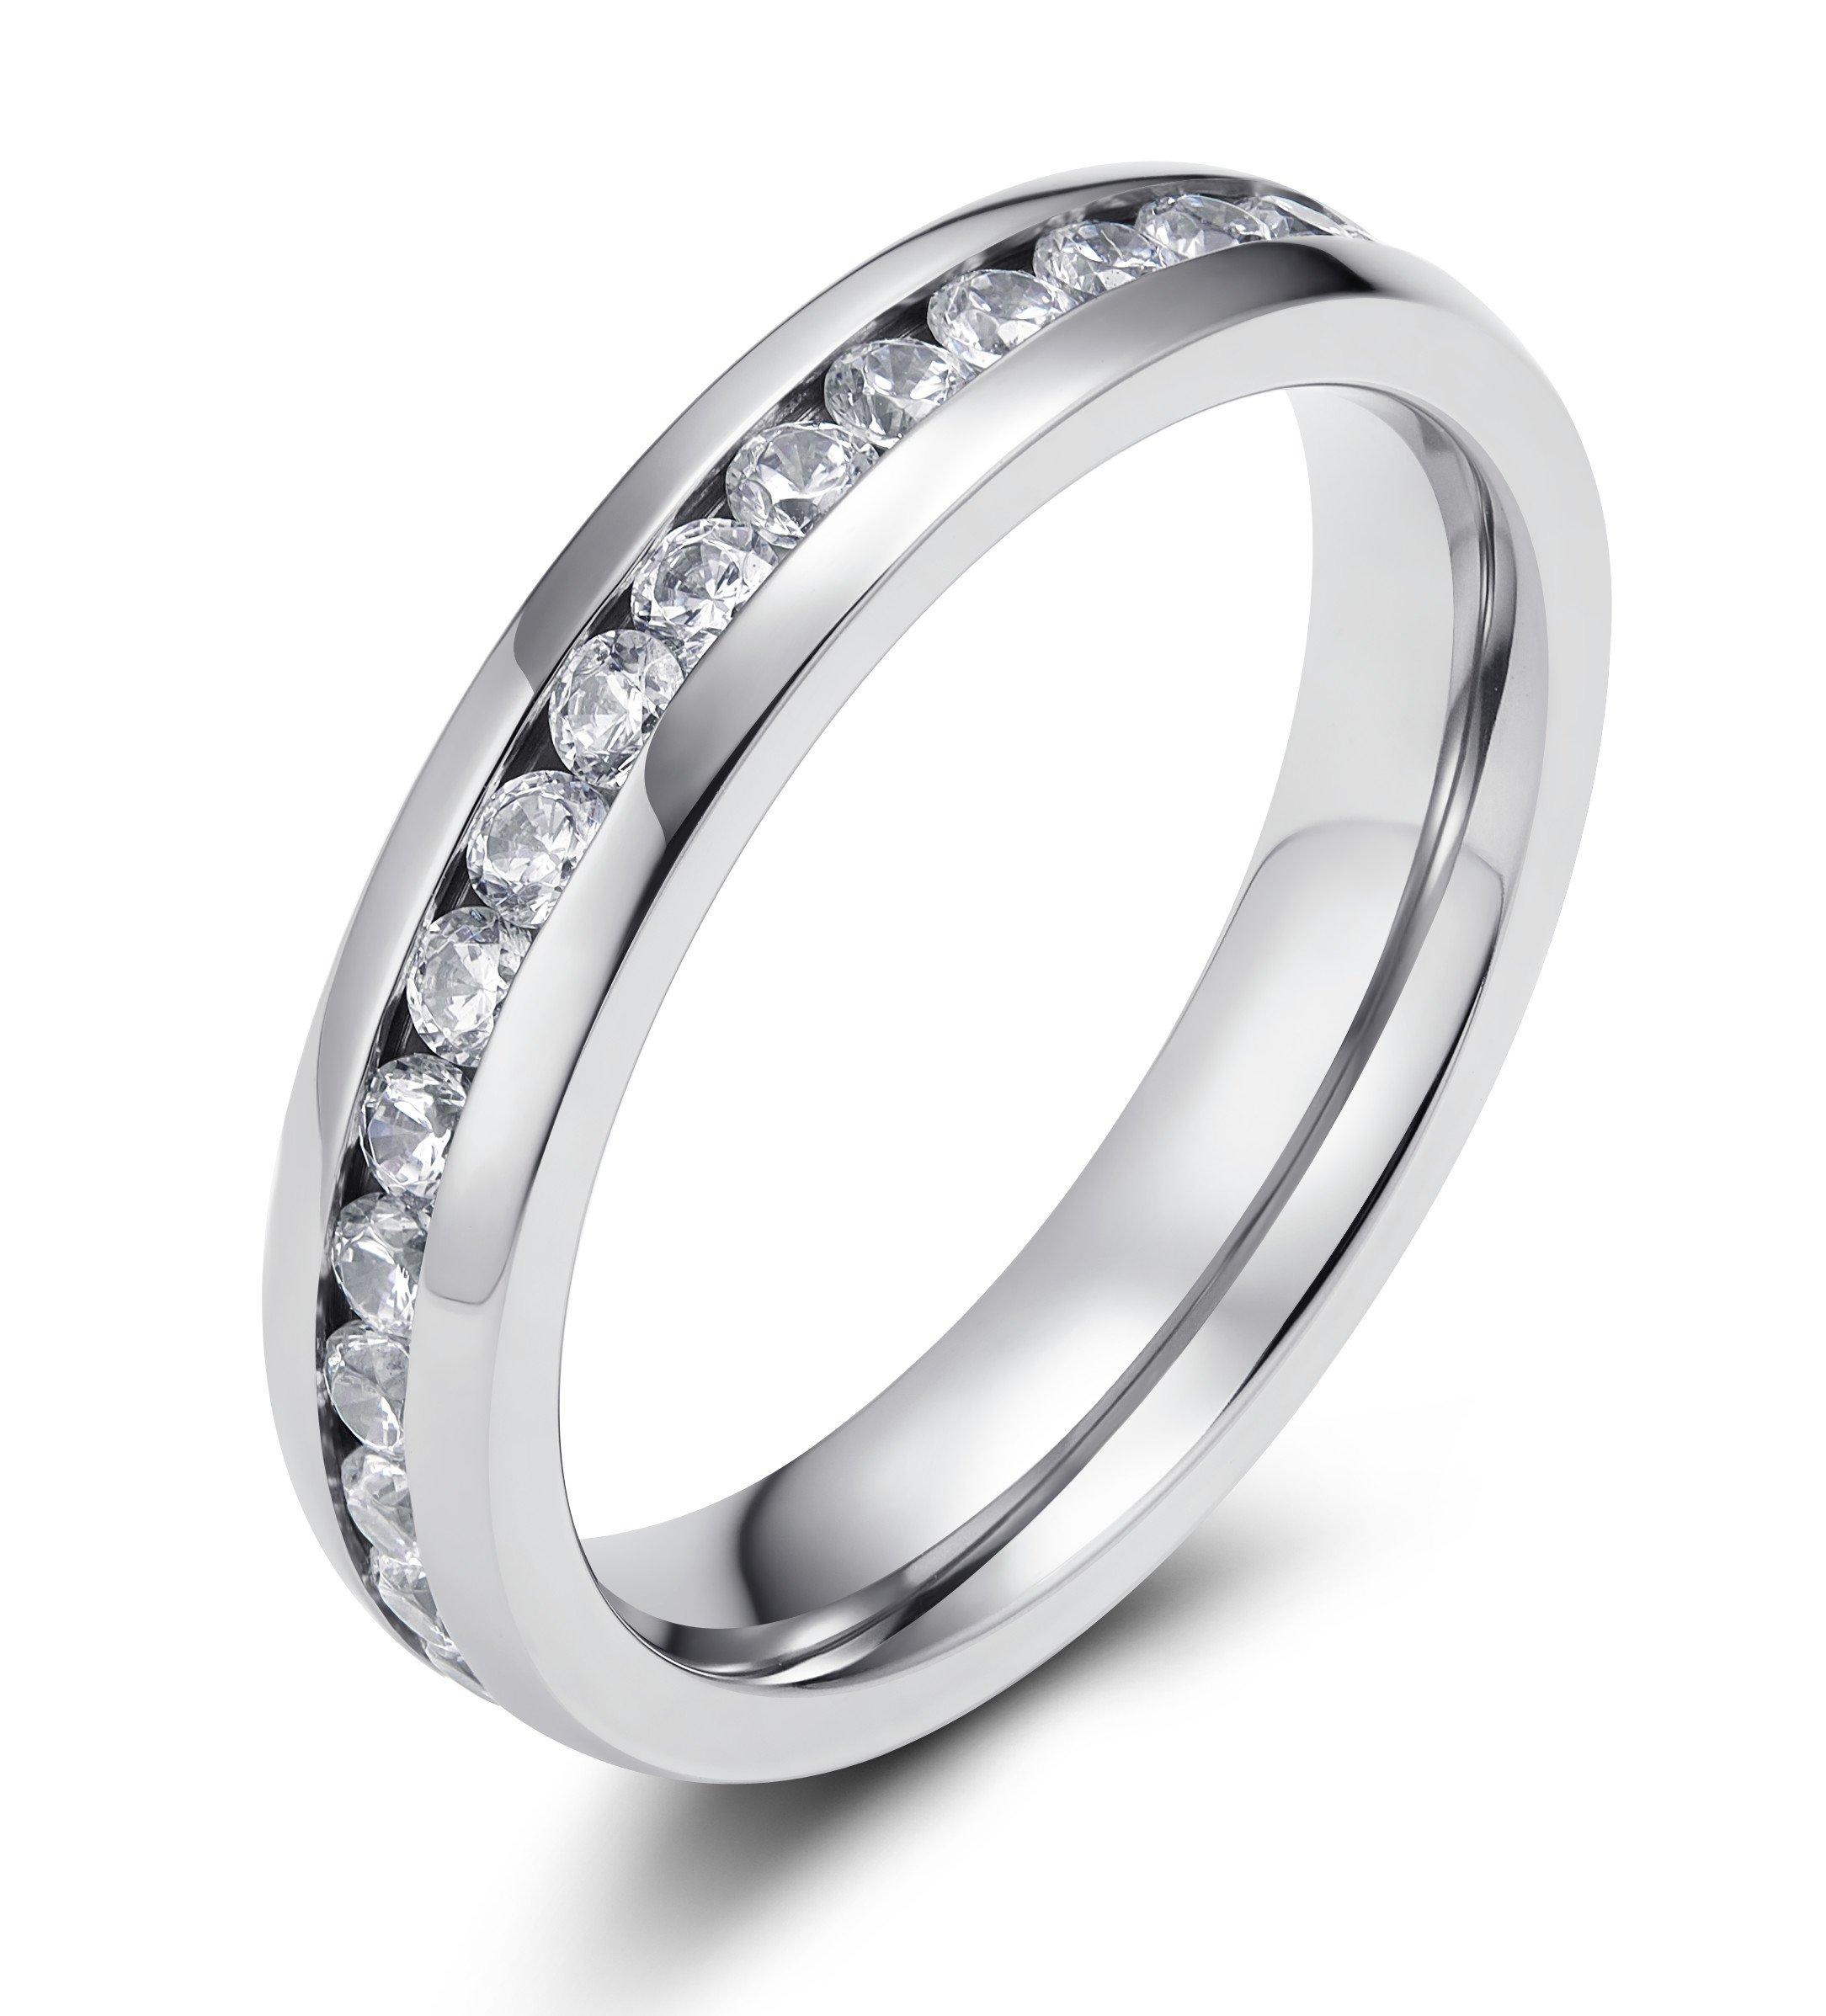 TIGRADE 4MM Eternity Titanium Ring Wedding Band with Cubic Zirconia (7)